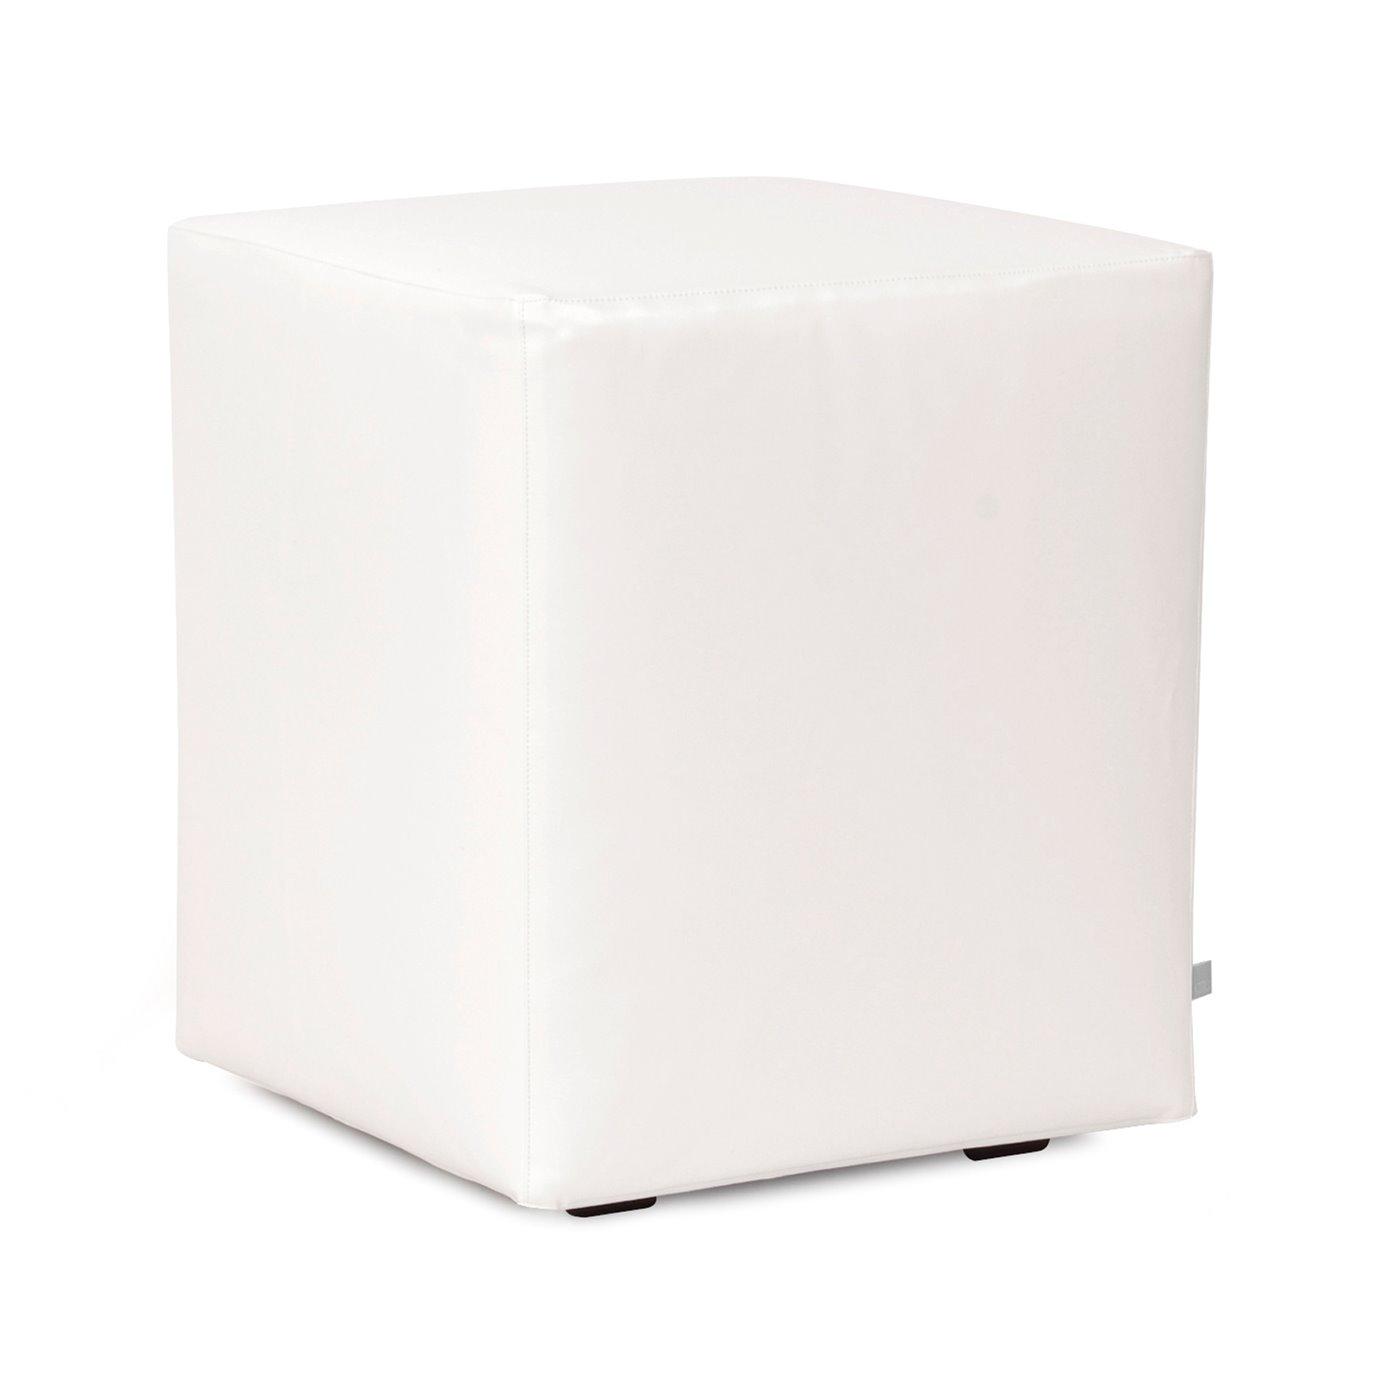 Howard Elliott Universal Cube Outdoor Marine Grade Vinyl Atlantis White Complete Ottoman